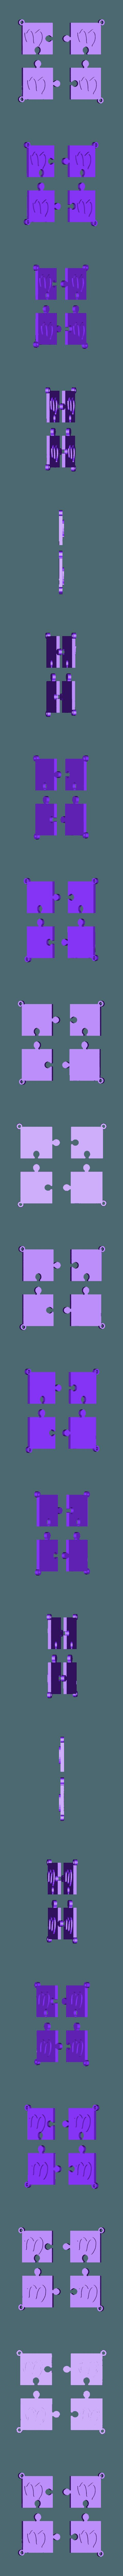 puzzle m.stl Download STL file puzzle key ring • 3D printing design, catf3d